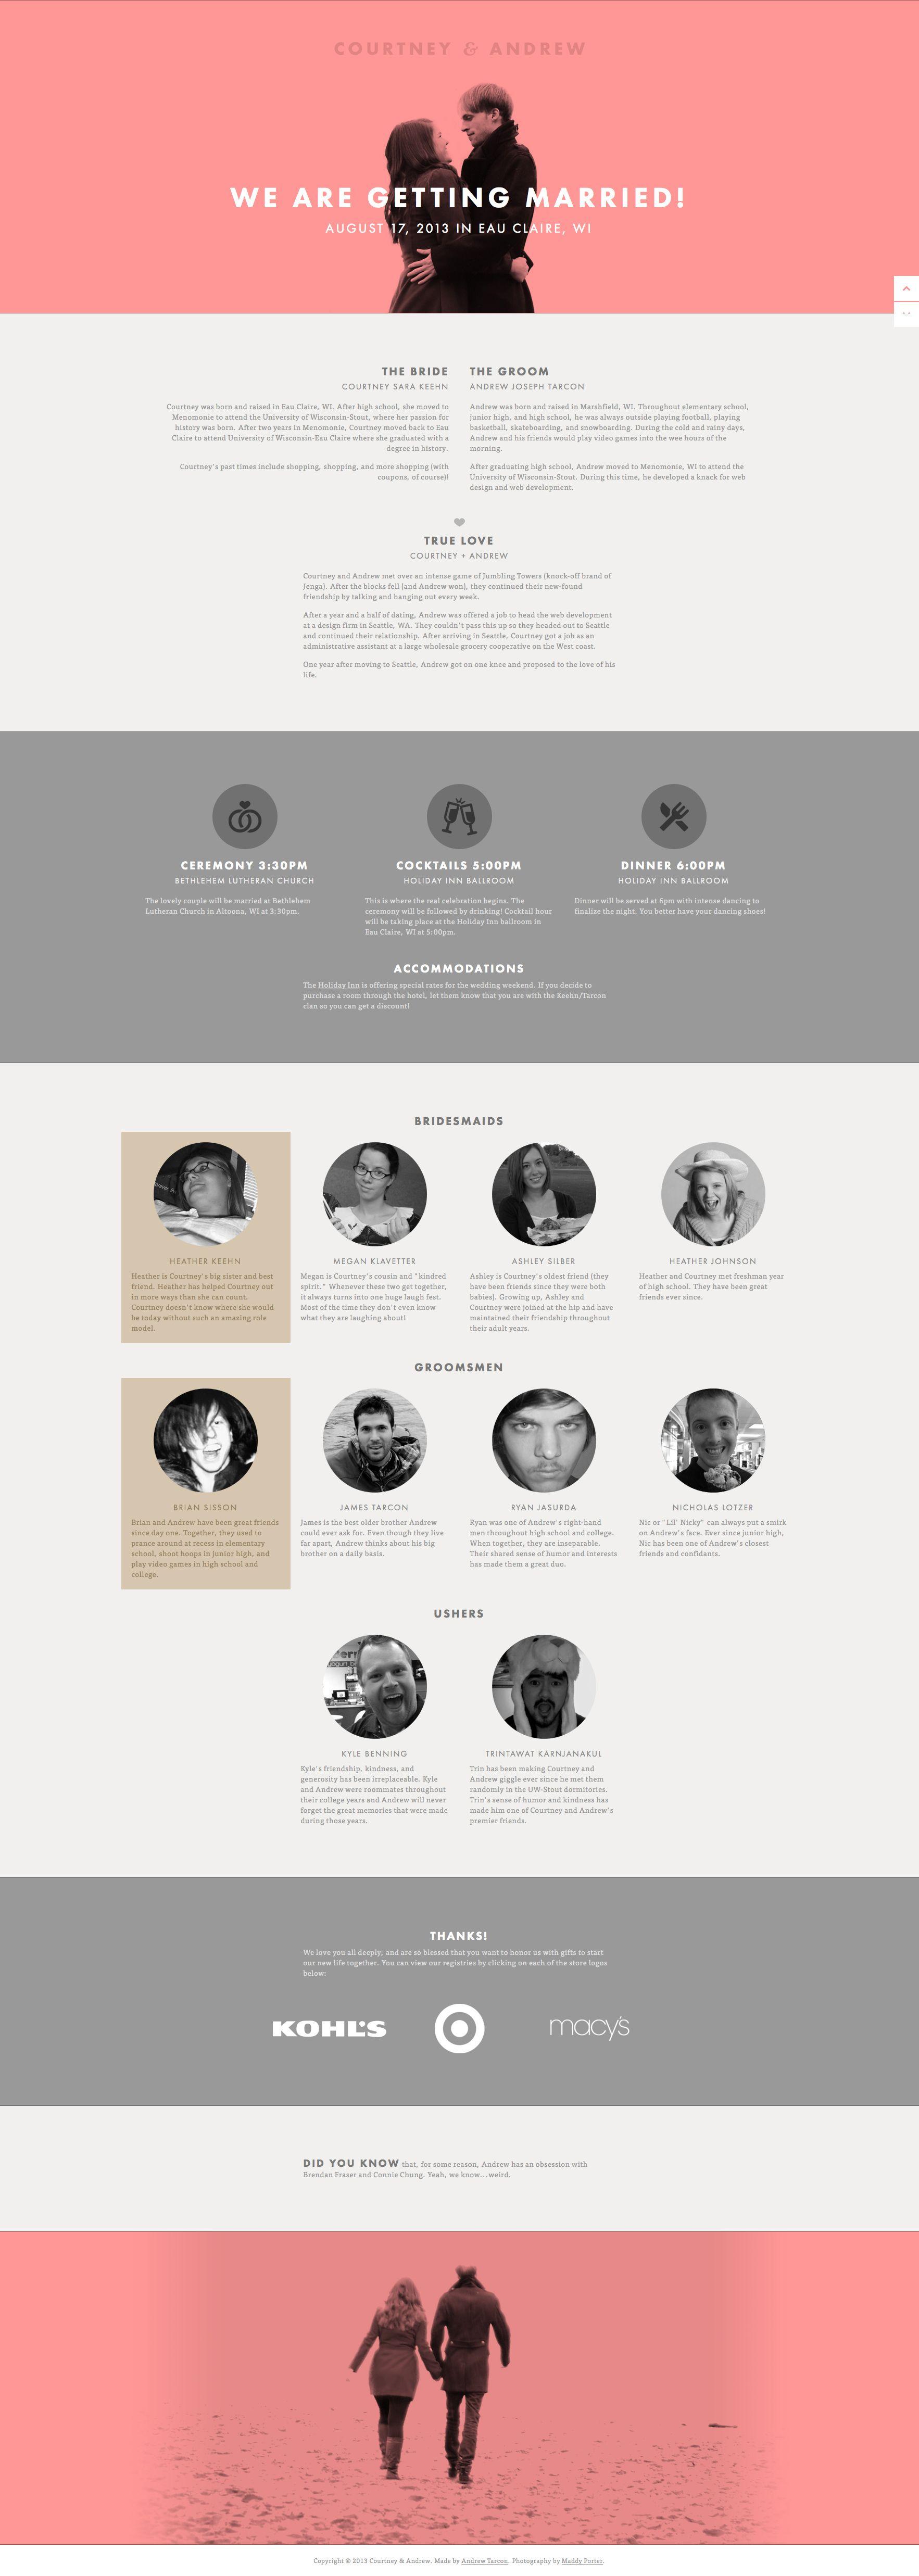 Bendigo Web Design Ecommerce And Small Business Web Design That